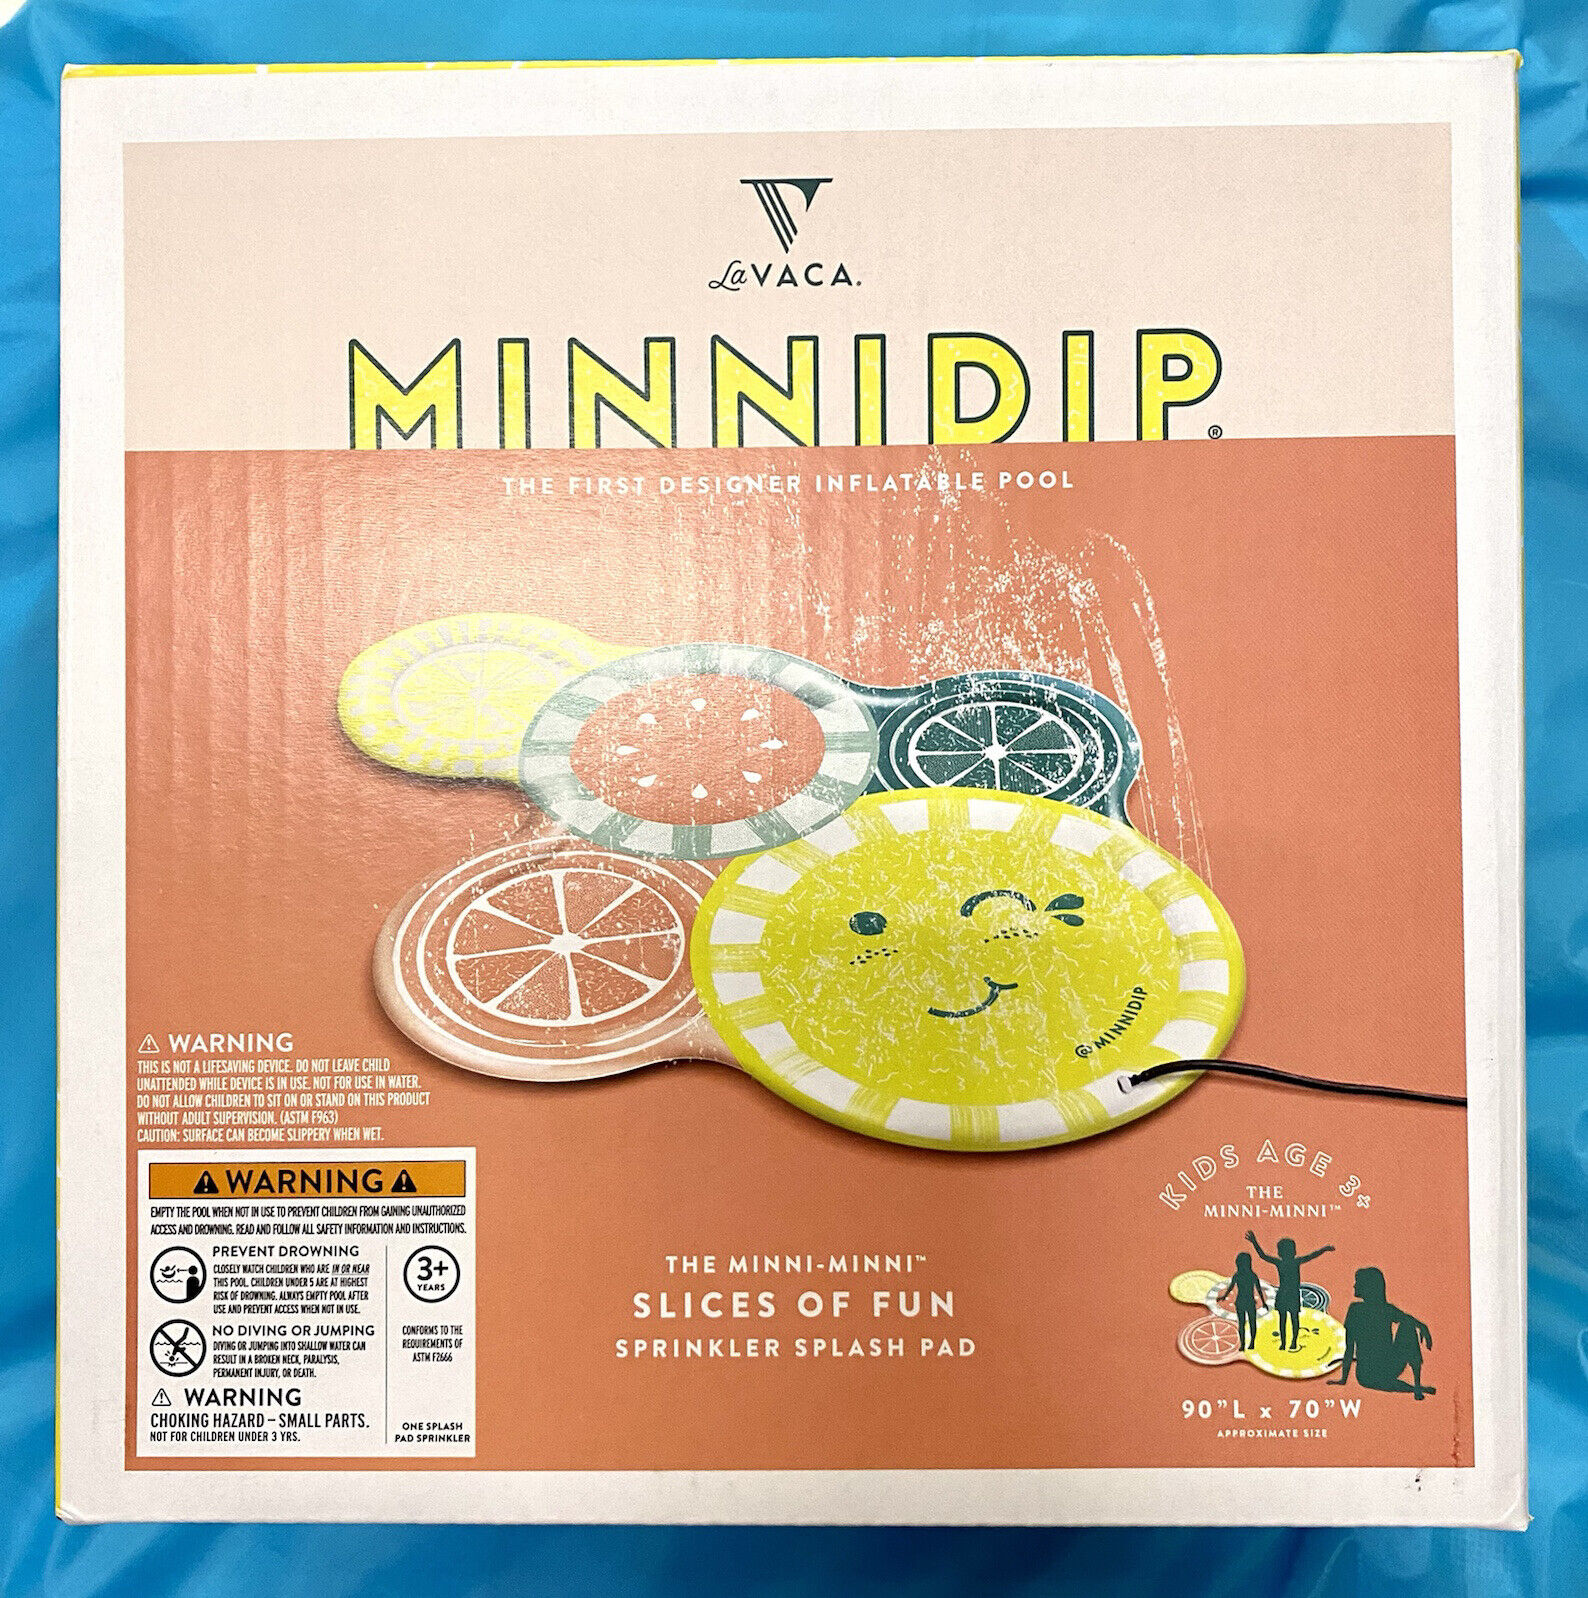 Minnidip The Slice Of Fun Sprinkler Splash Pad Pool Kids Summer La Vaca New